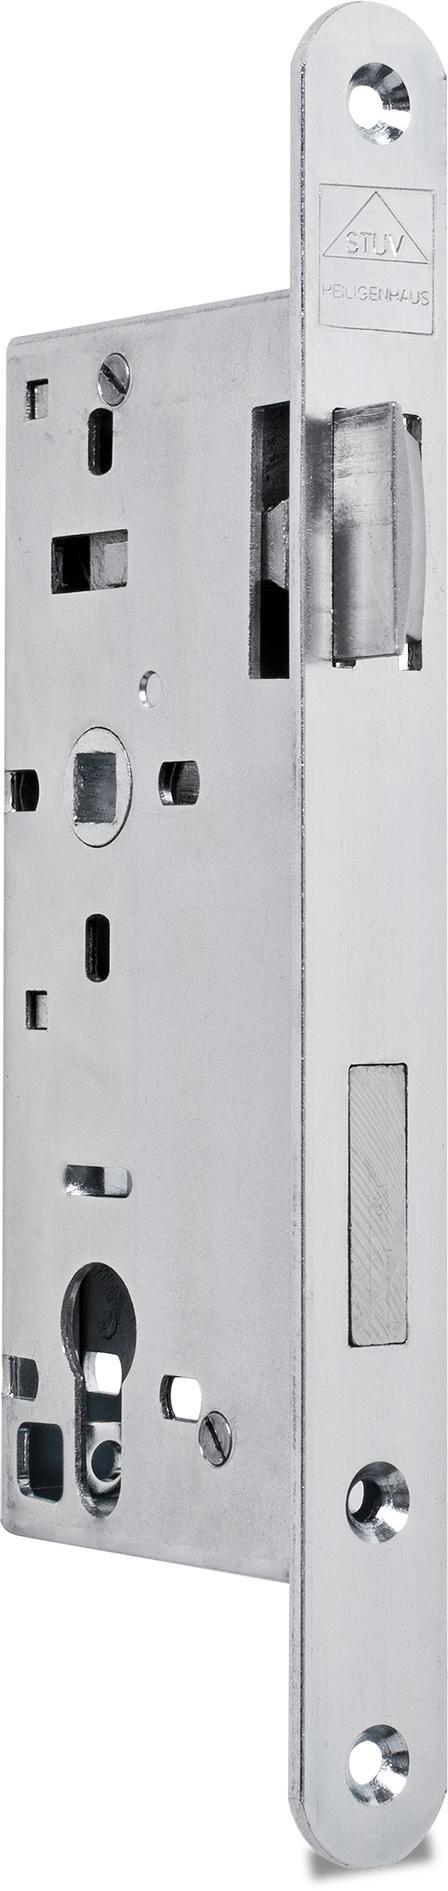 Einsteckschloss mit Wechsel, Dornmaß 50 mm, Entfernung 72 mm, Vierkantnuss 9 mm, Falle und Riegel bündig, DIN links (Falle nach Öffnen des Schlosses umlegbar)